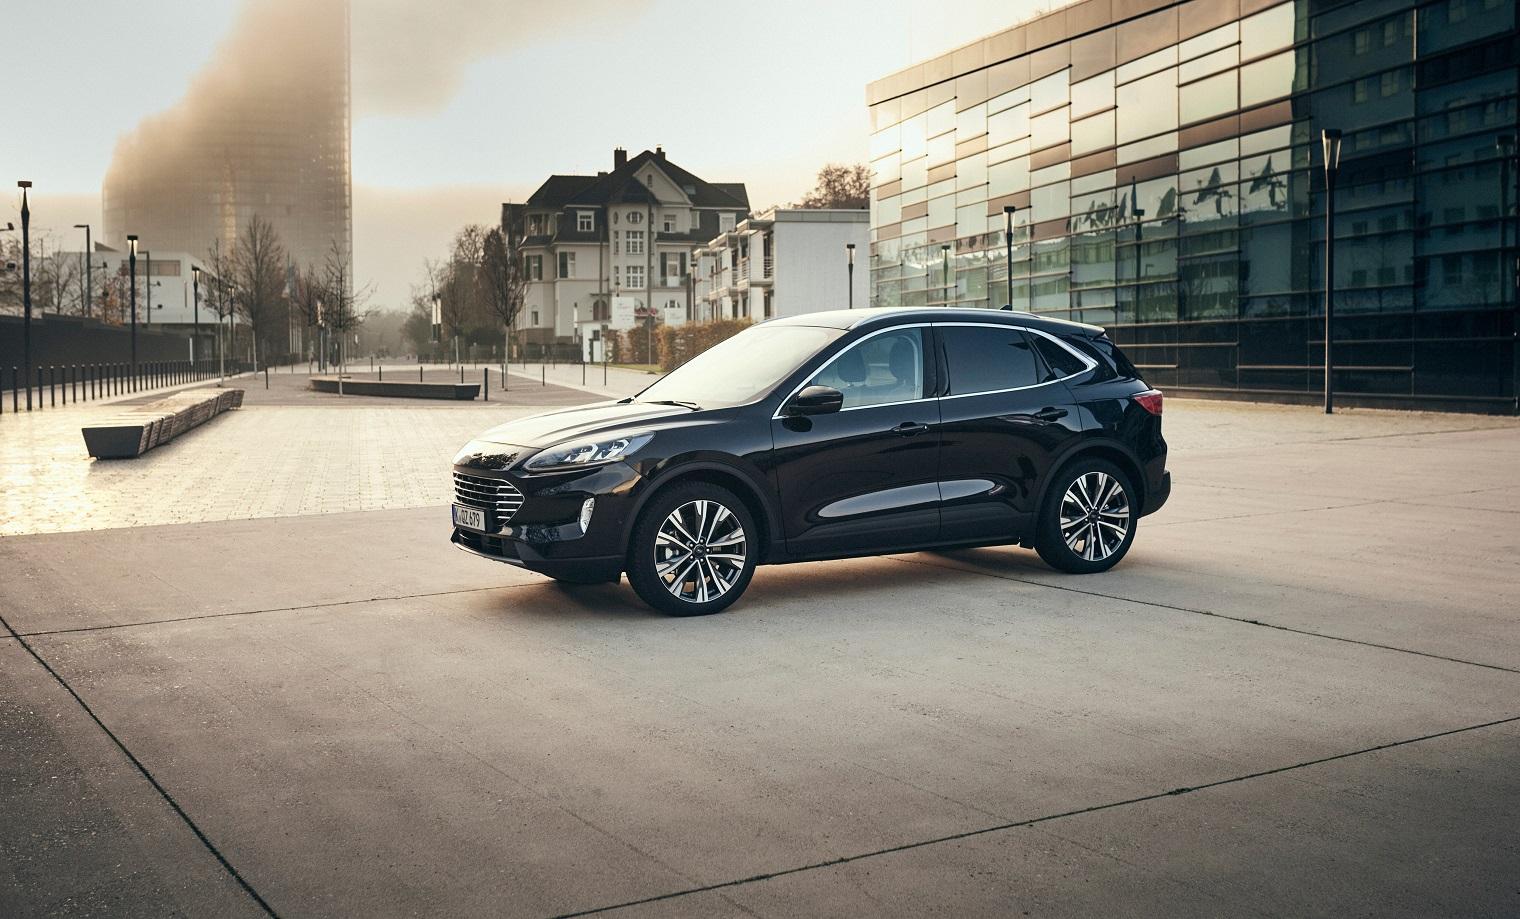 nuova-Ford-Kuga-full-hybrid-2021-esterni